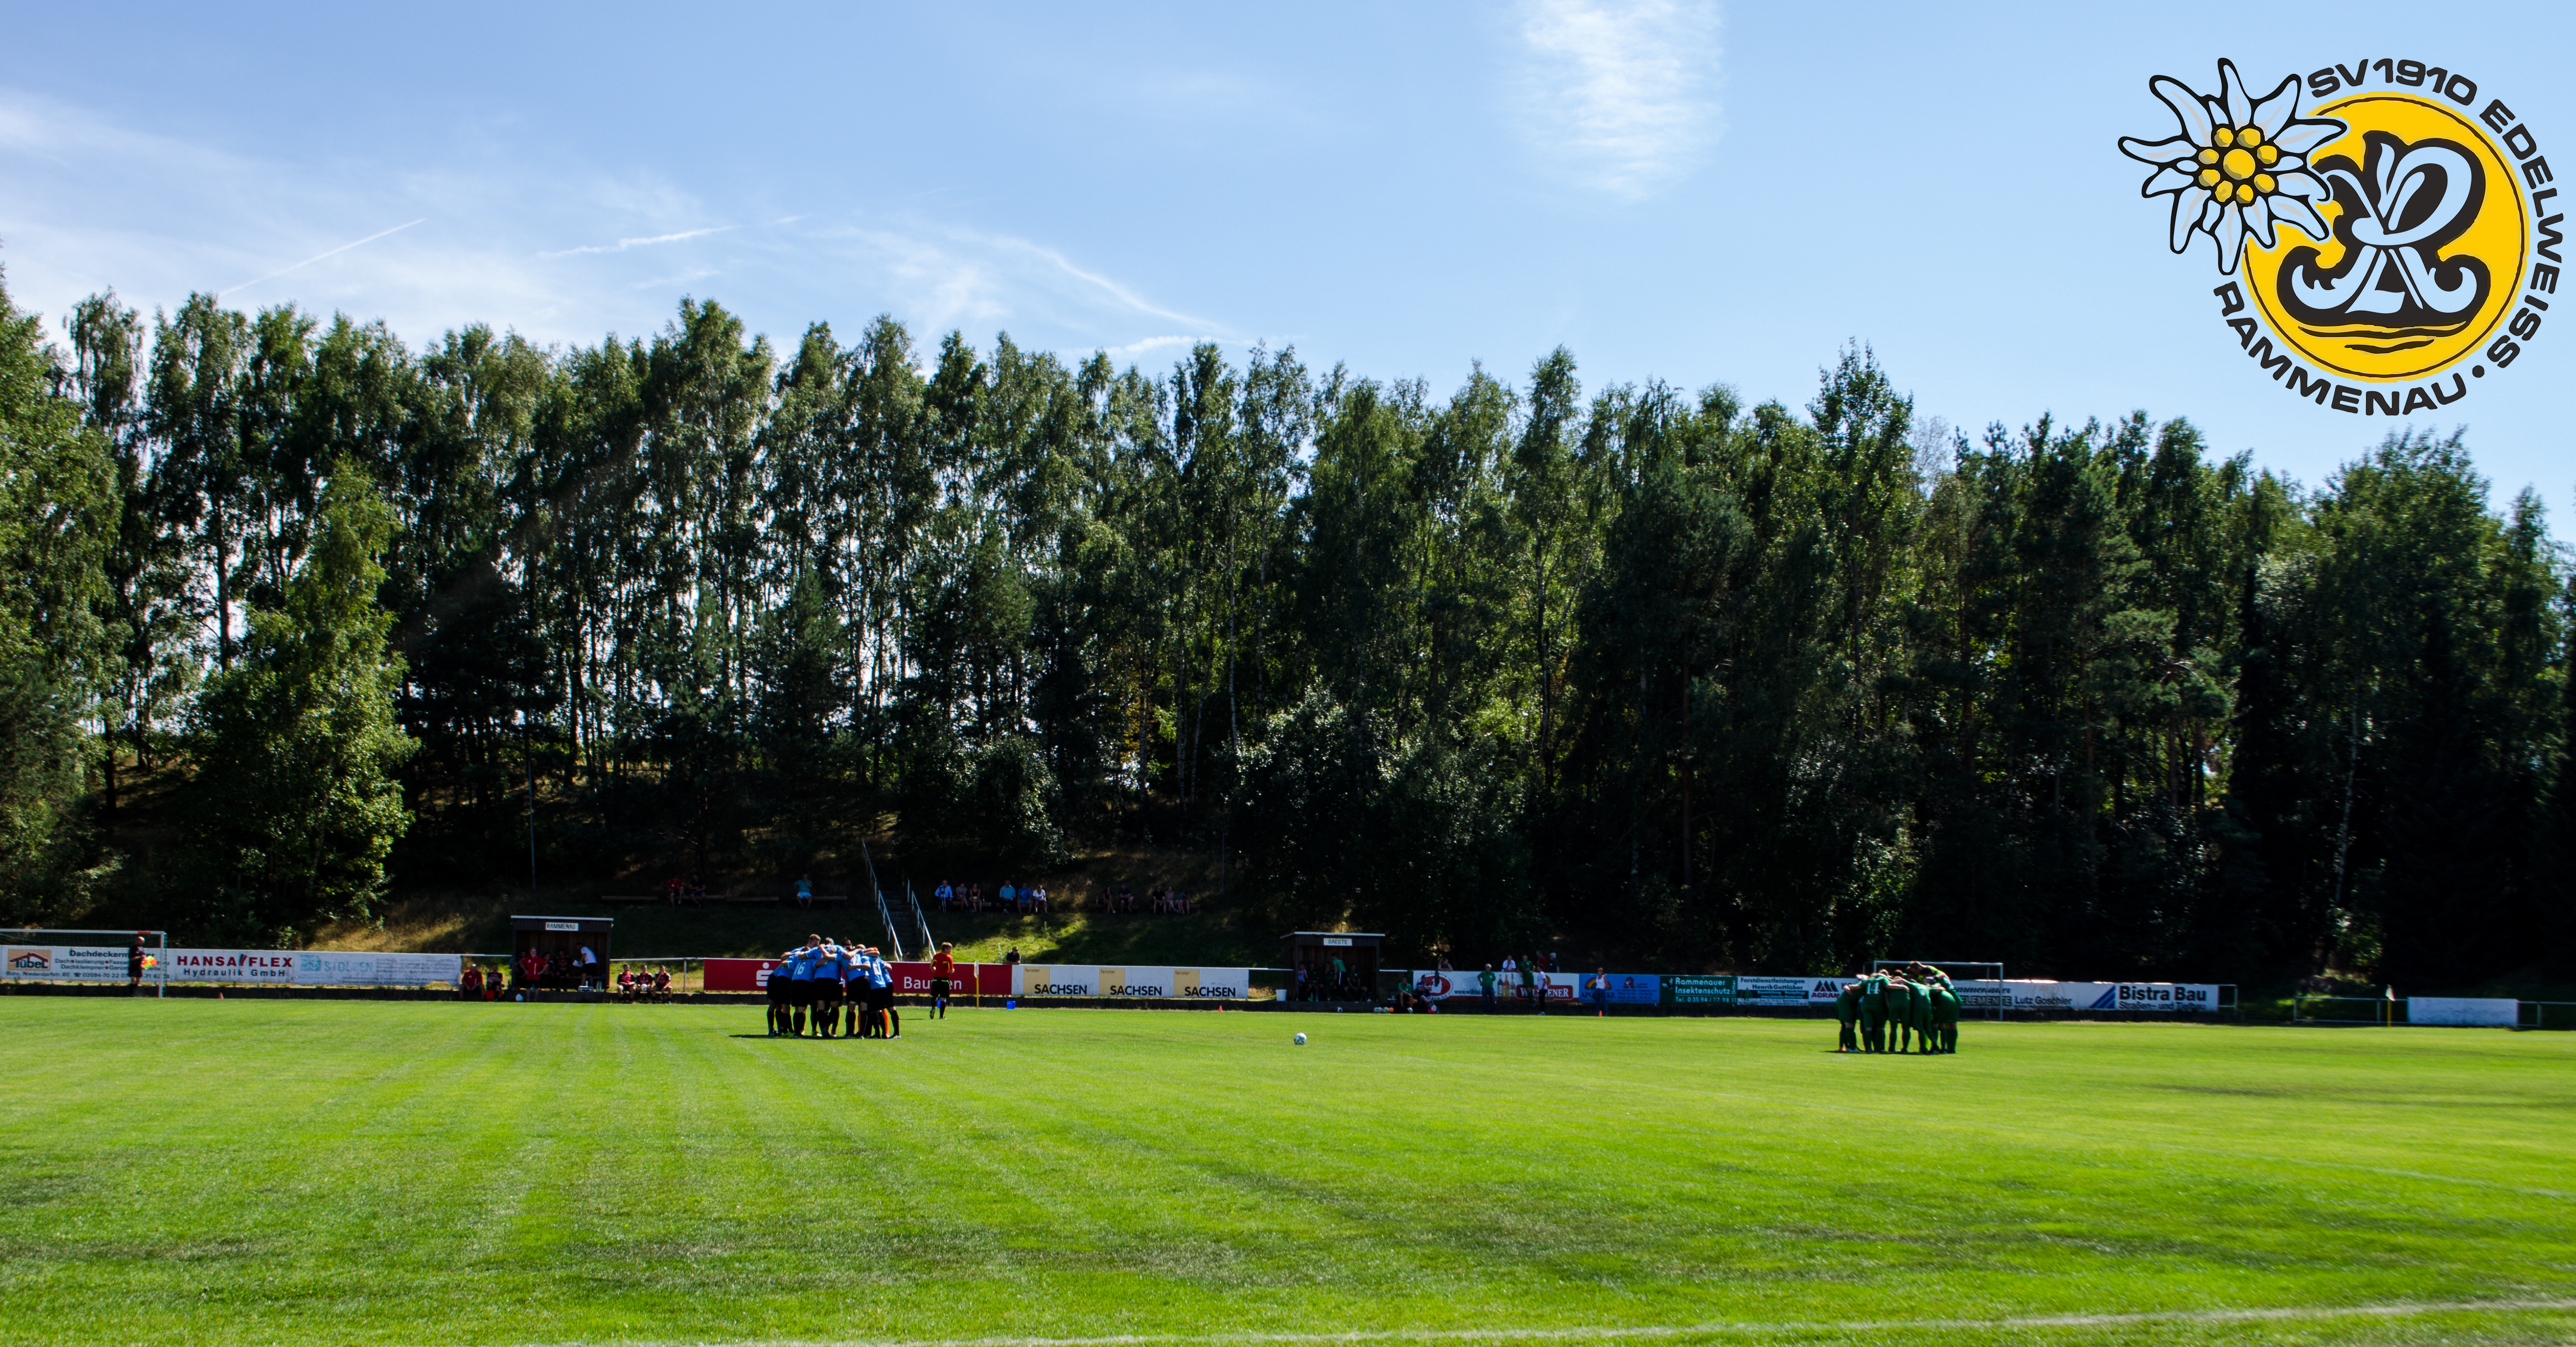 SV Edelweiß Rammenau vs Hoyerswerdaer FC 2018